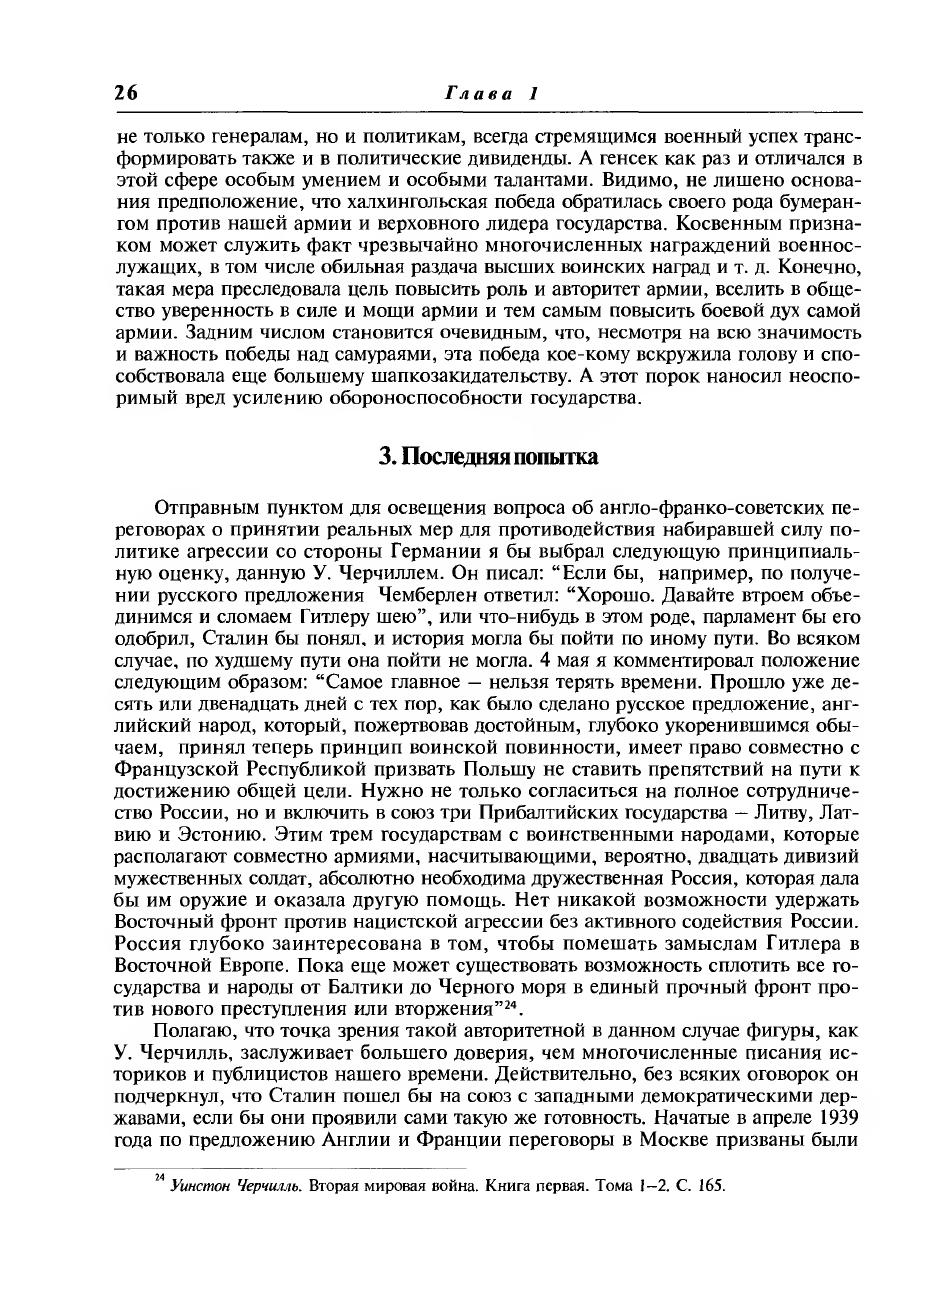 http://images.vfl.ru/ii/1406824152/4ef3a959/5860236.jpg